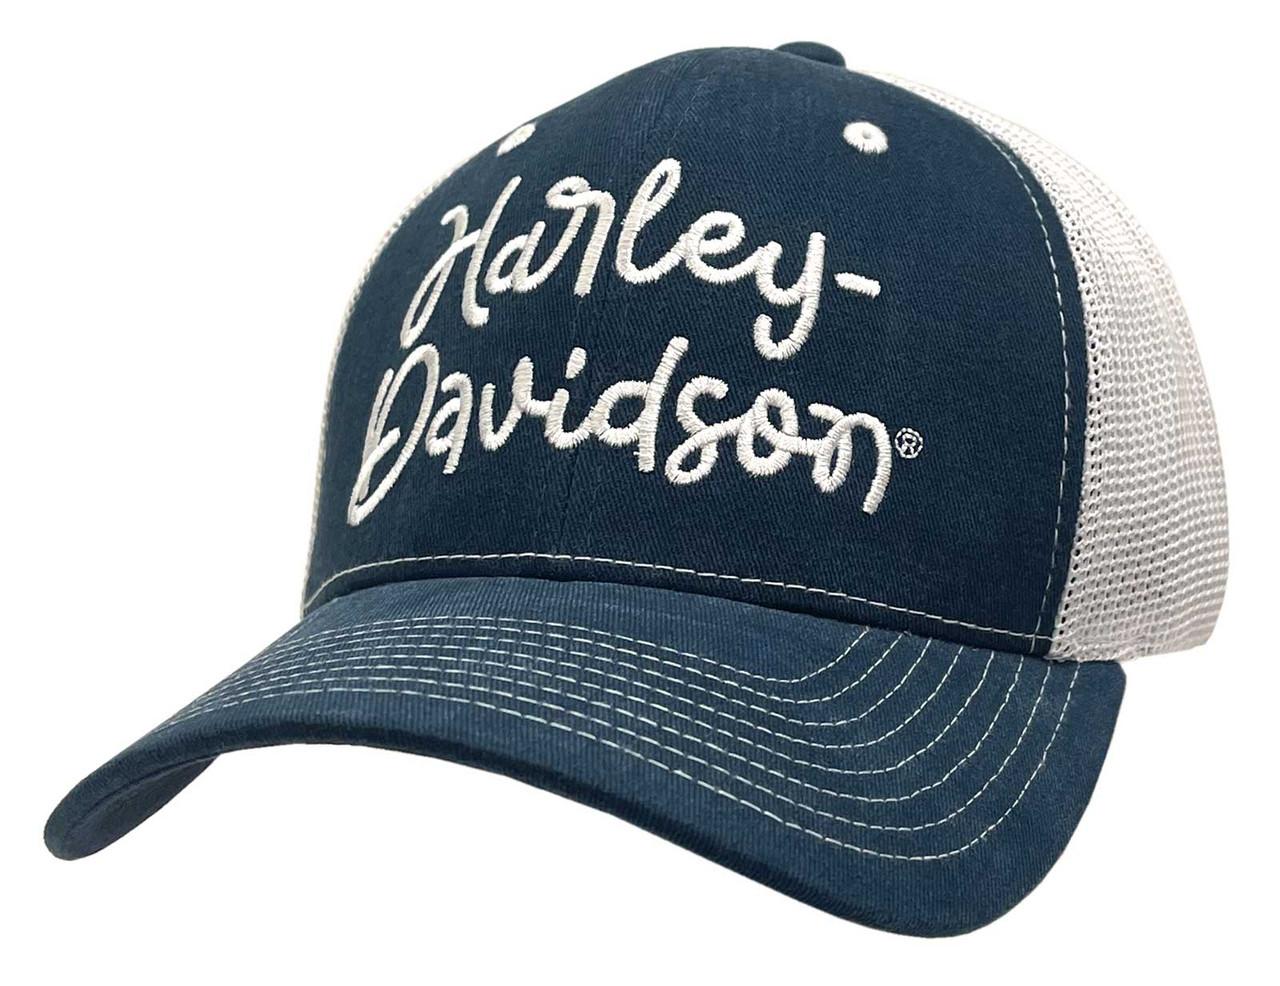 Harley-Davidson® Women s Embroidered Harley Script Baseball Cap ... 2eeb259443